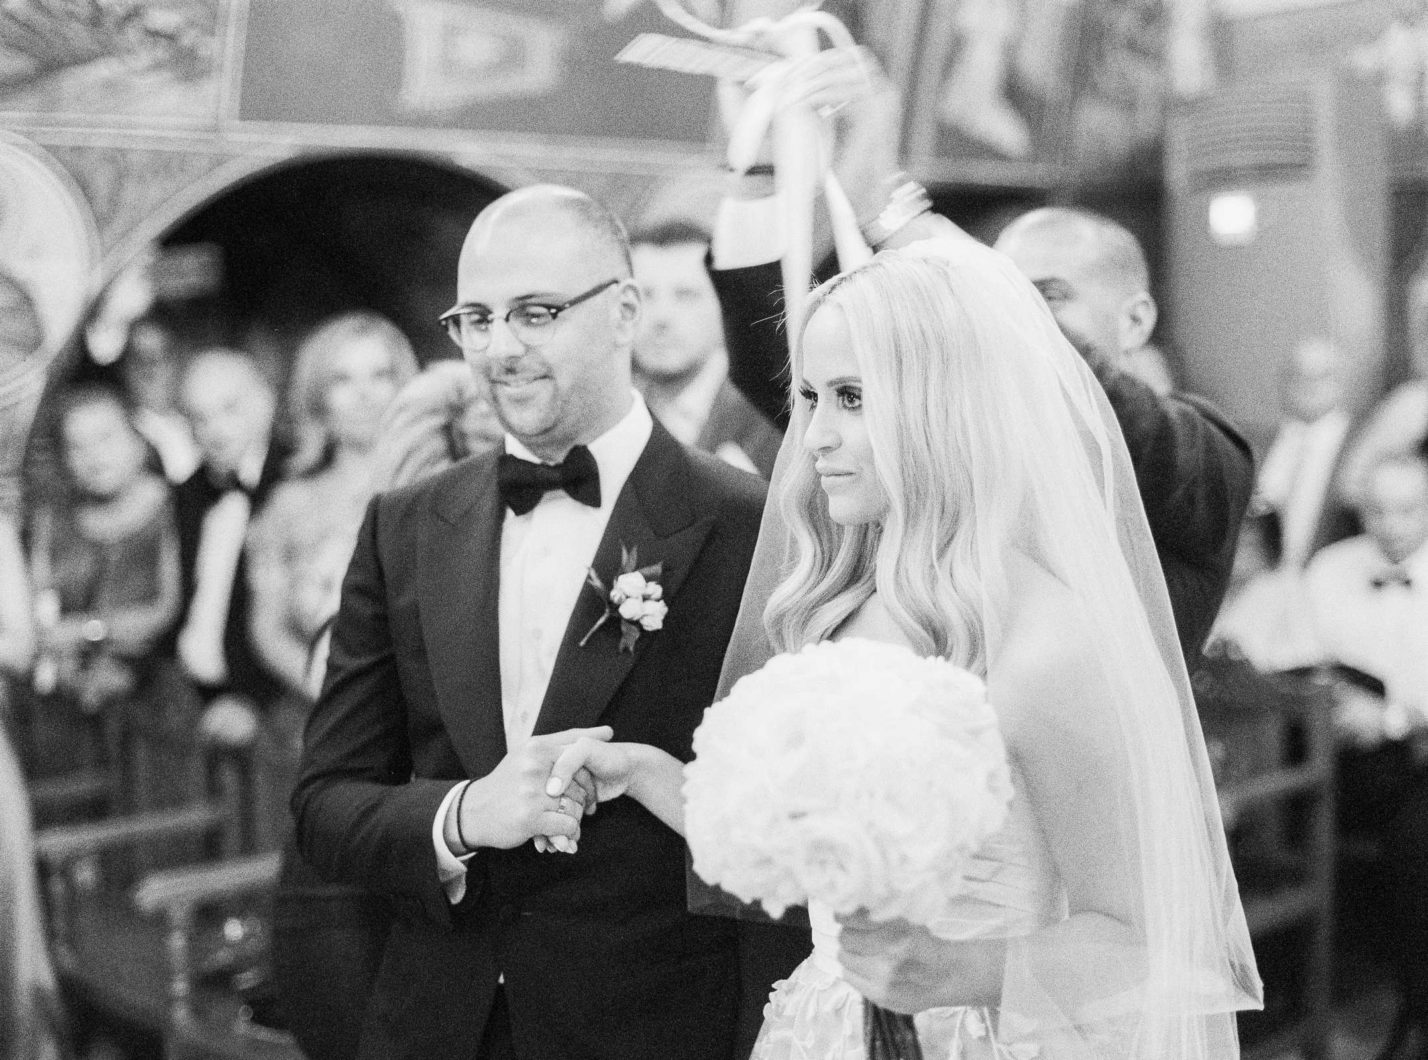 paros-wedding-photographer-tomas-dolejsi